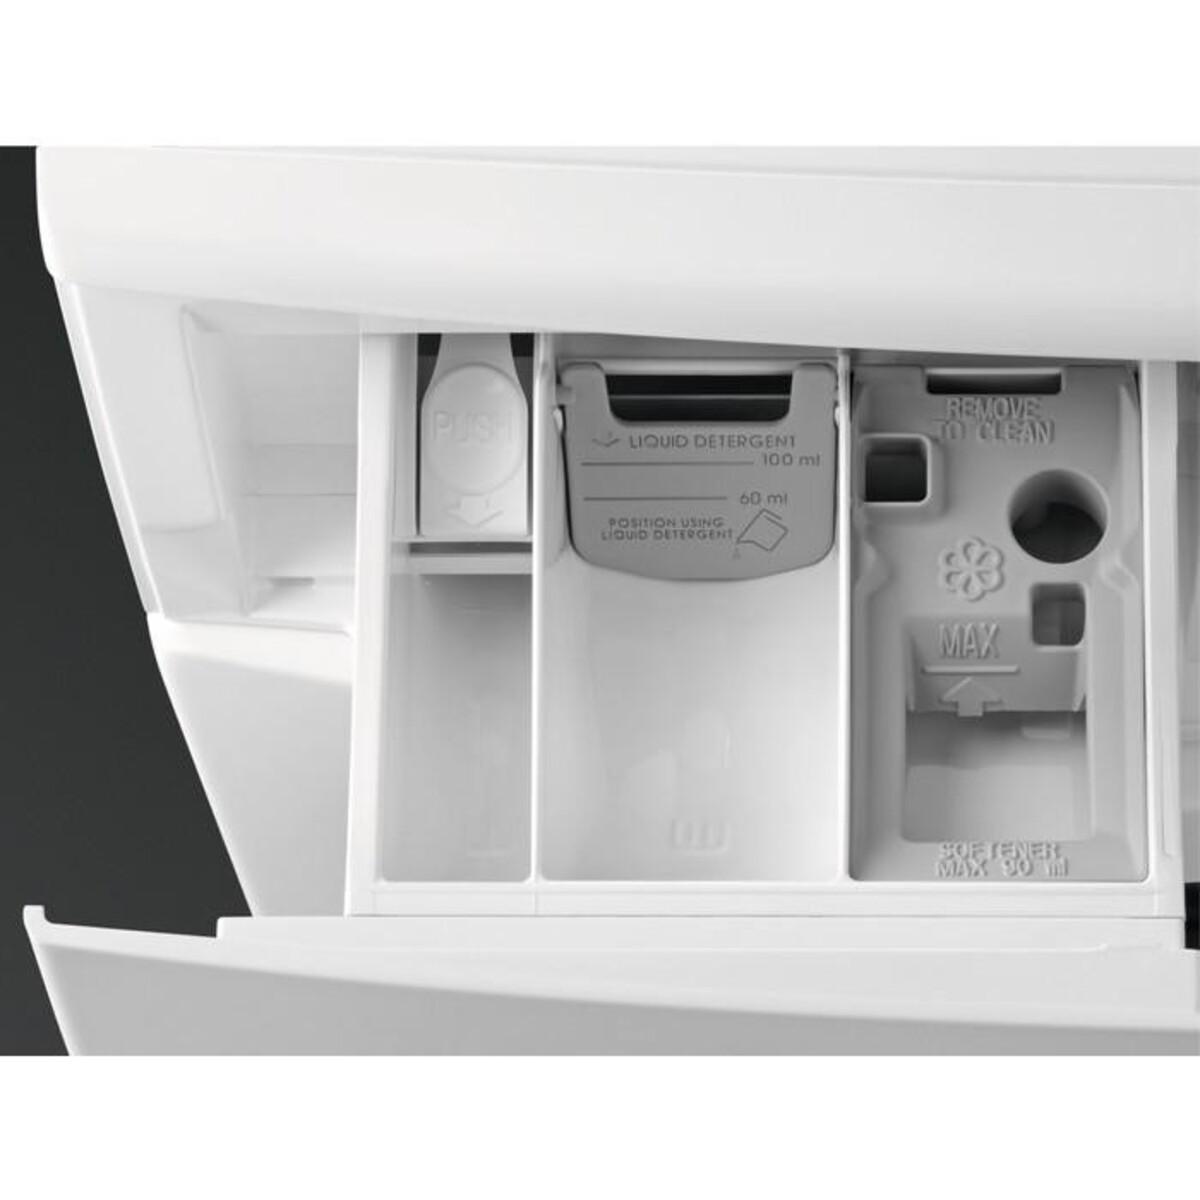 Bild 5 von AEG LAVAMAT L6FL700EX Waschmaschine (A+++, 7 kg, 1400 U/min, Display, Schontrommel, Aqua Control System, Alarm, XXL)